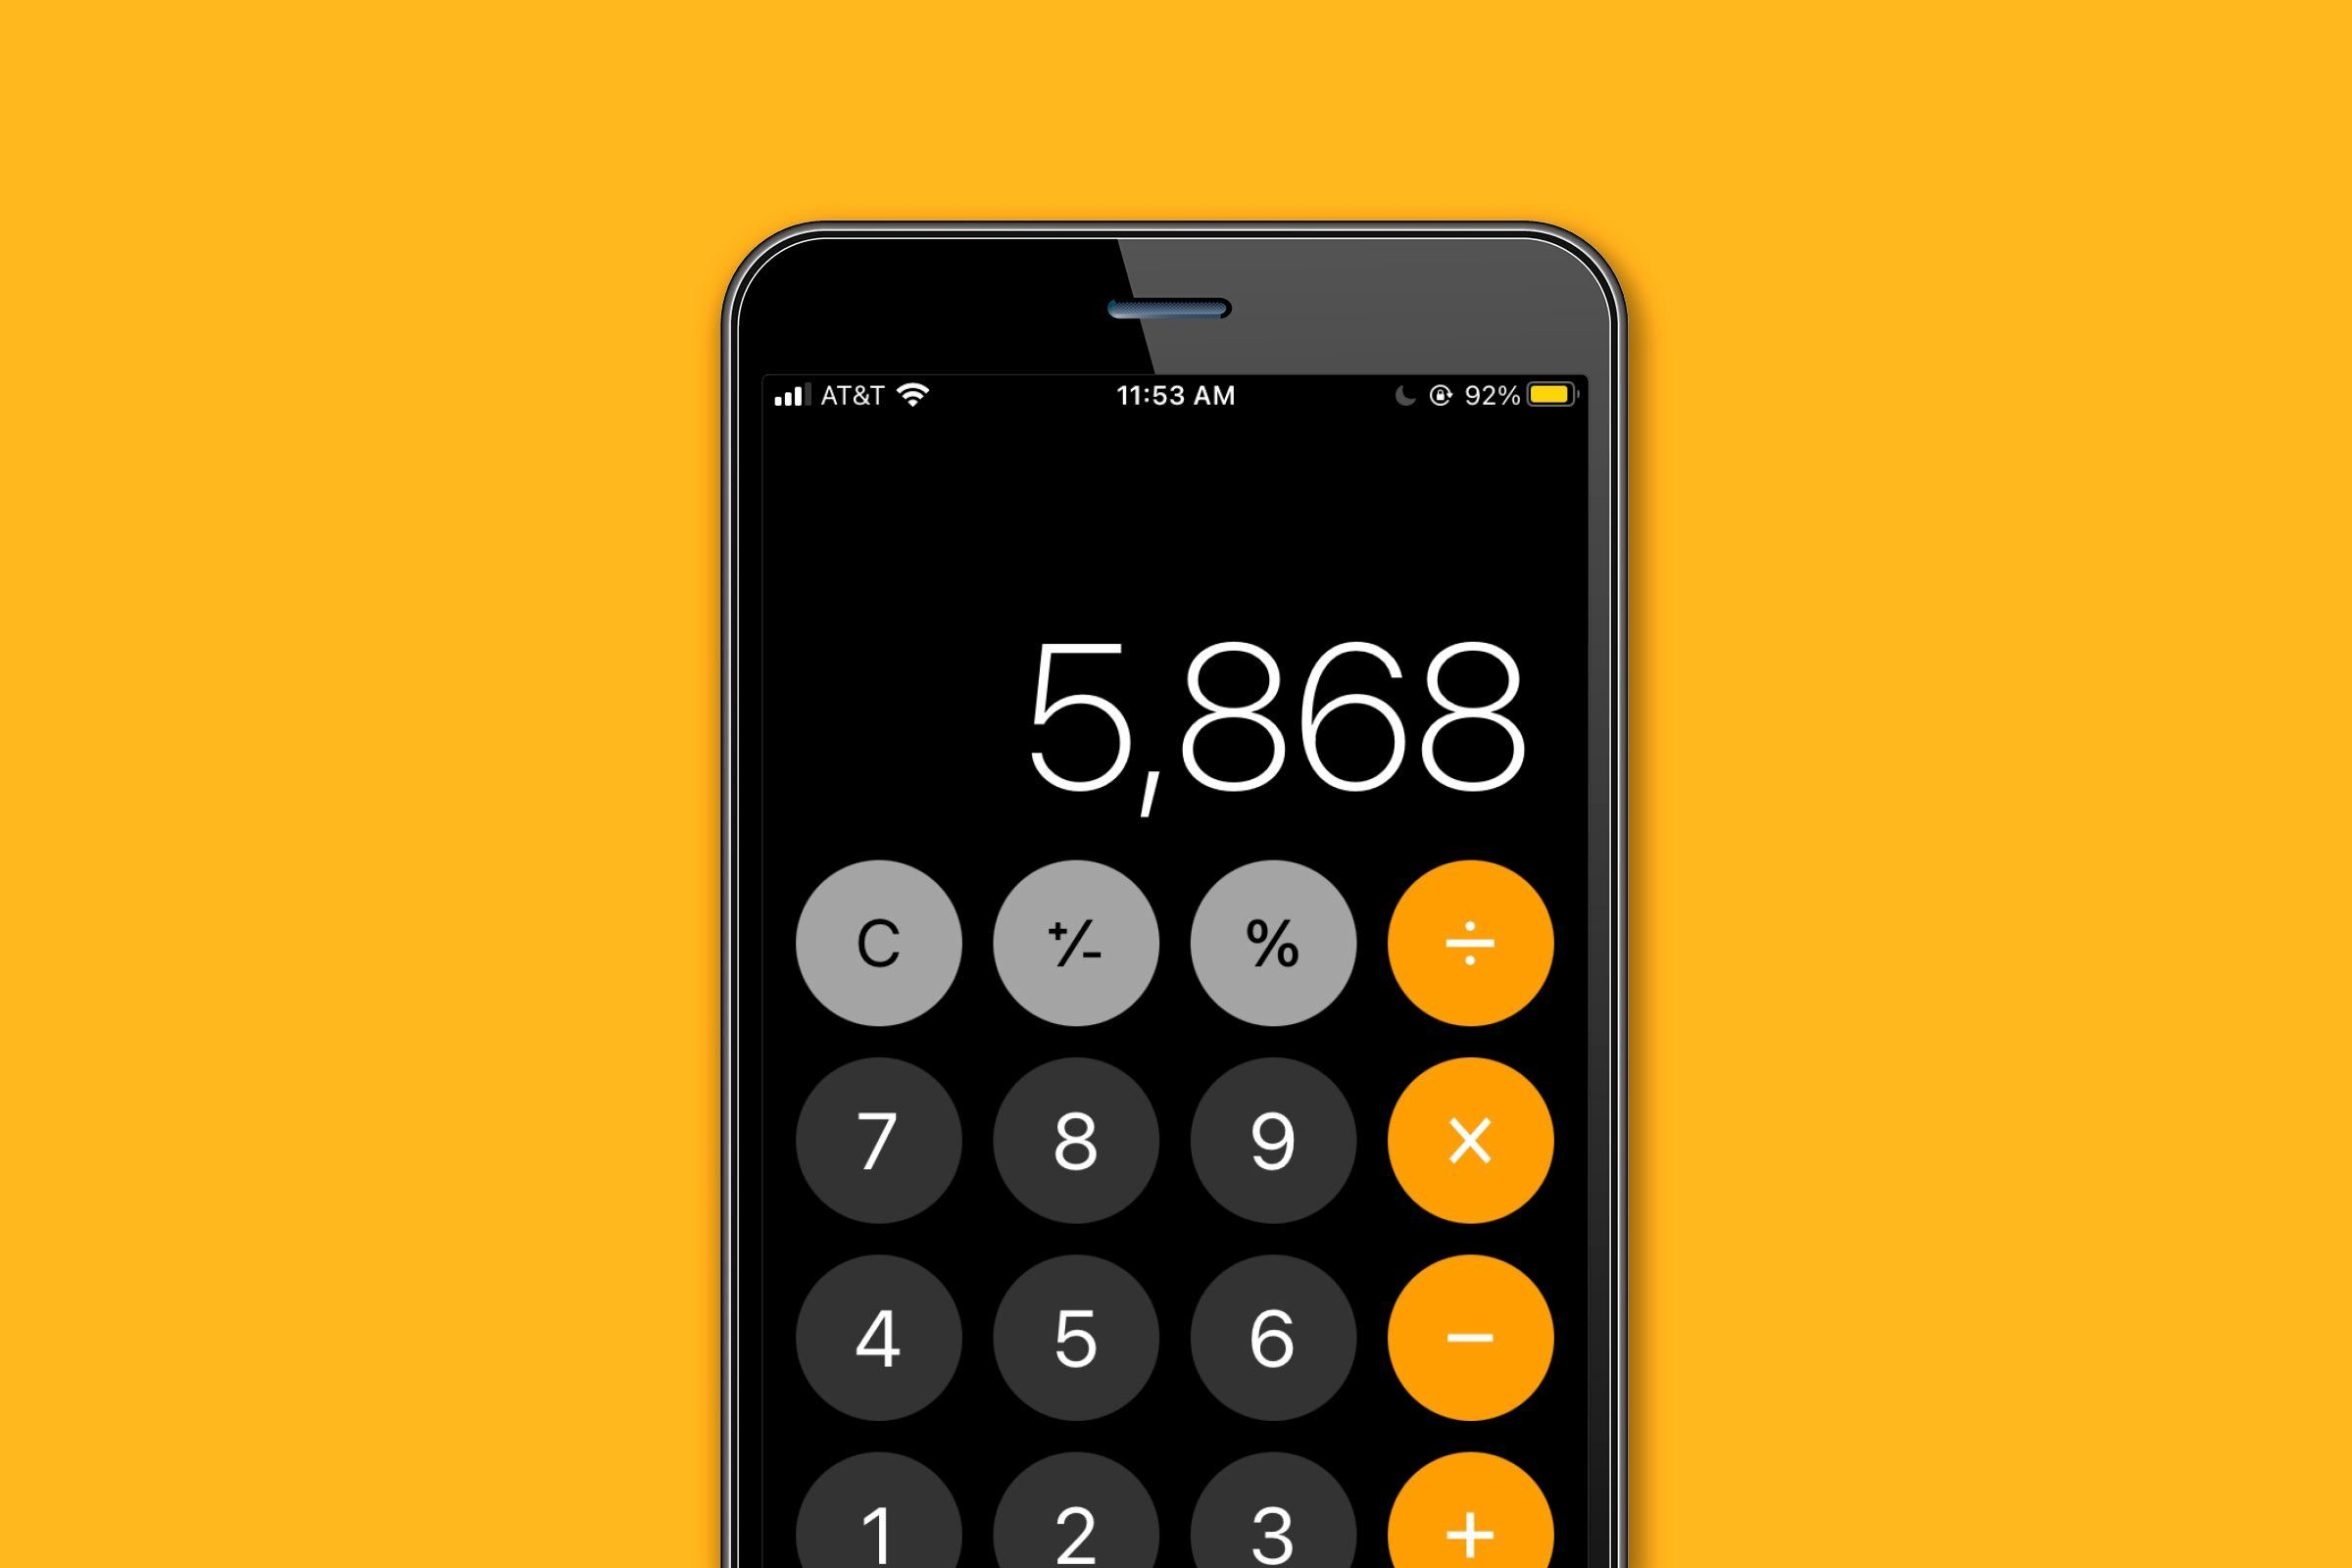 Access the calculator's hidden backspace button